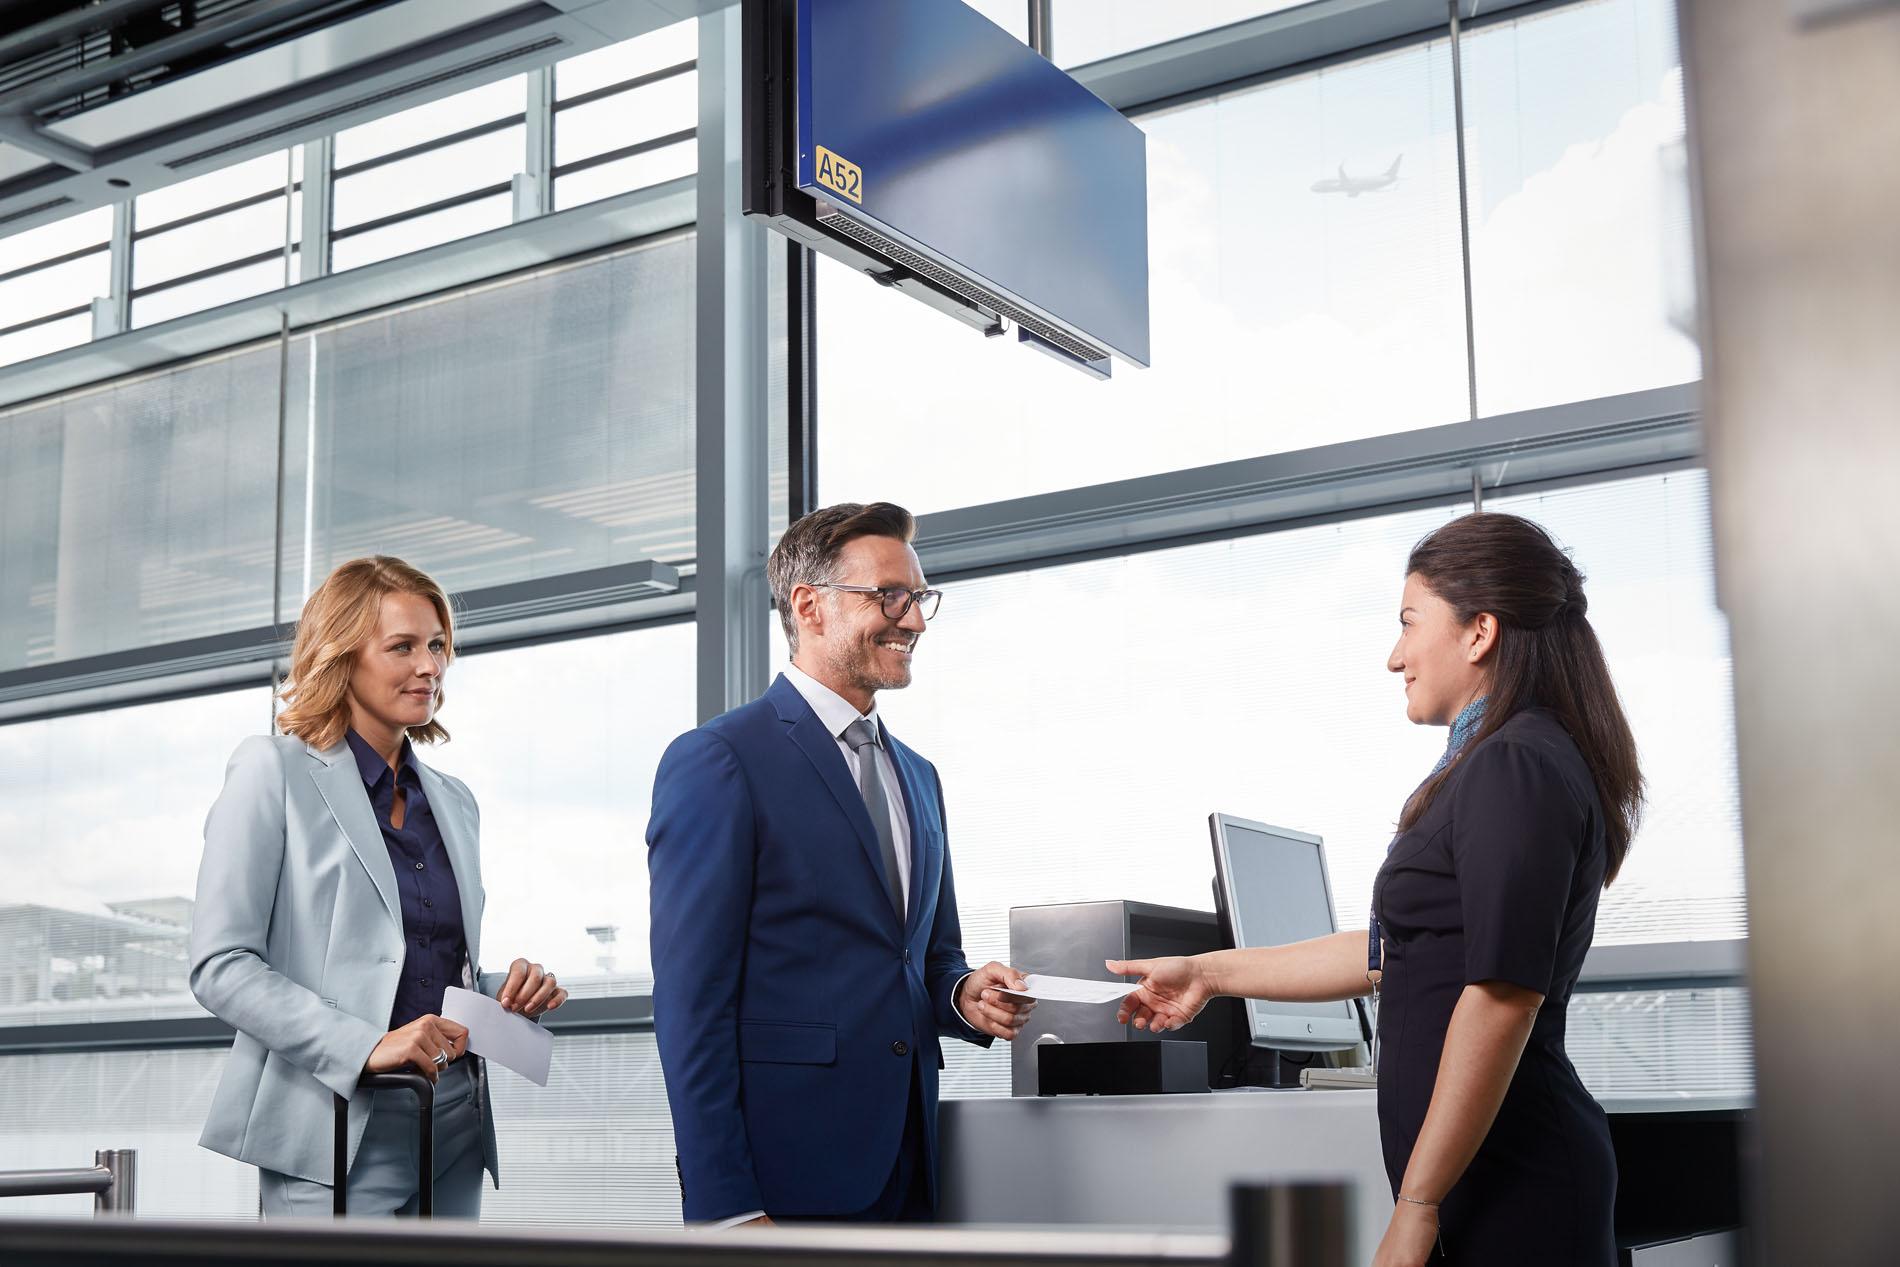 Flughafen Nürnberg - Business